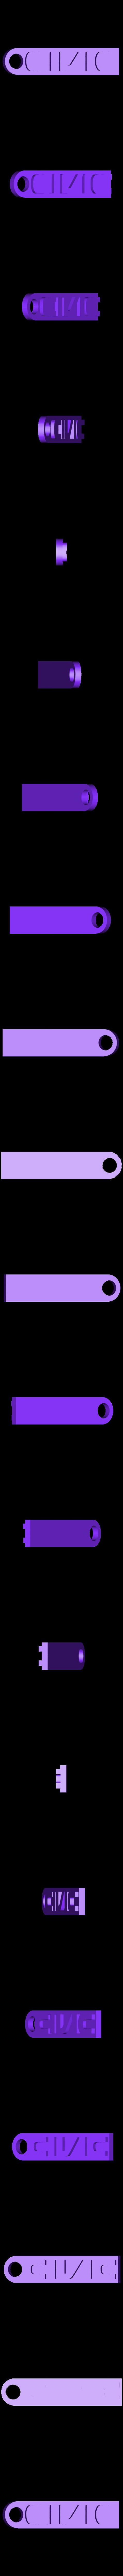 9WGiI3hyFRz_1.stl Download free STL file  Honda Civic Key Chain ( Strong ) • 3D printer design, 3DPrintingGurus